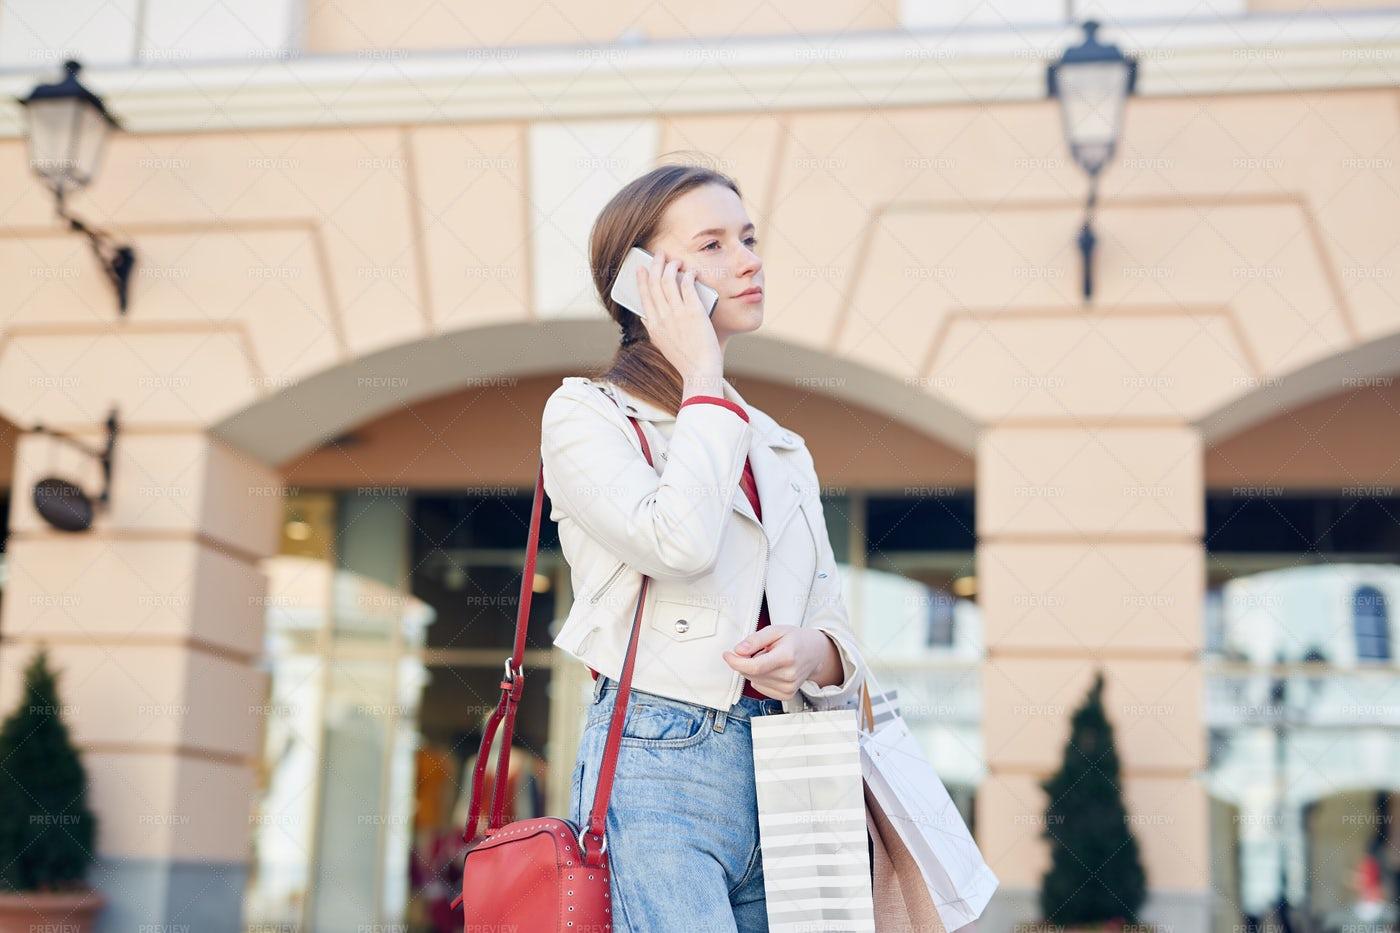 Girl Calling Cab After Shopping: Stock Photos